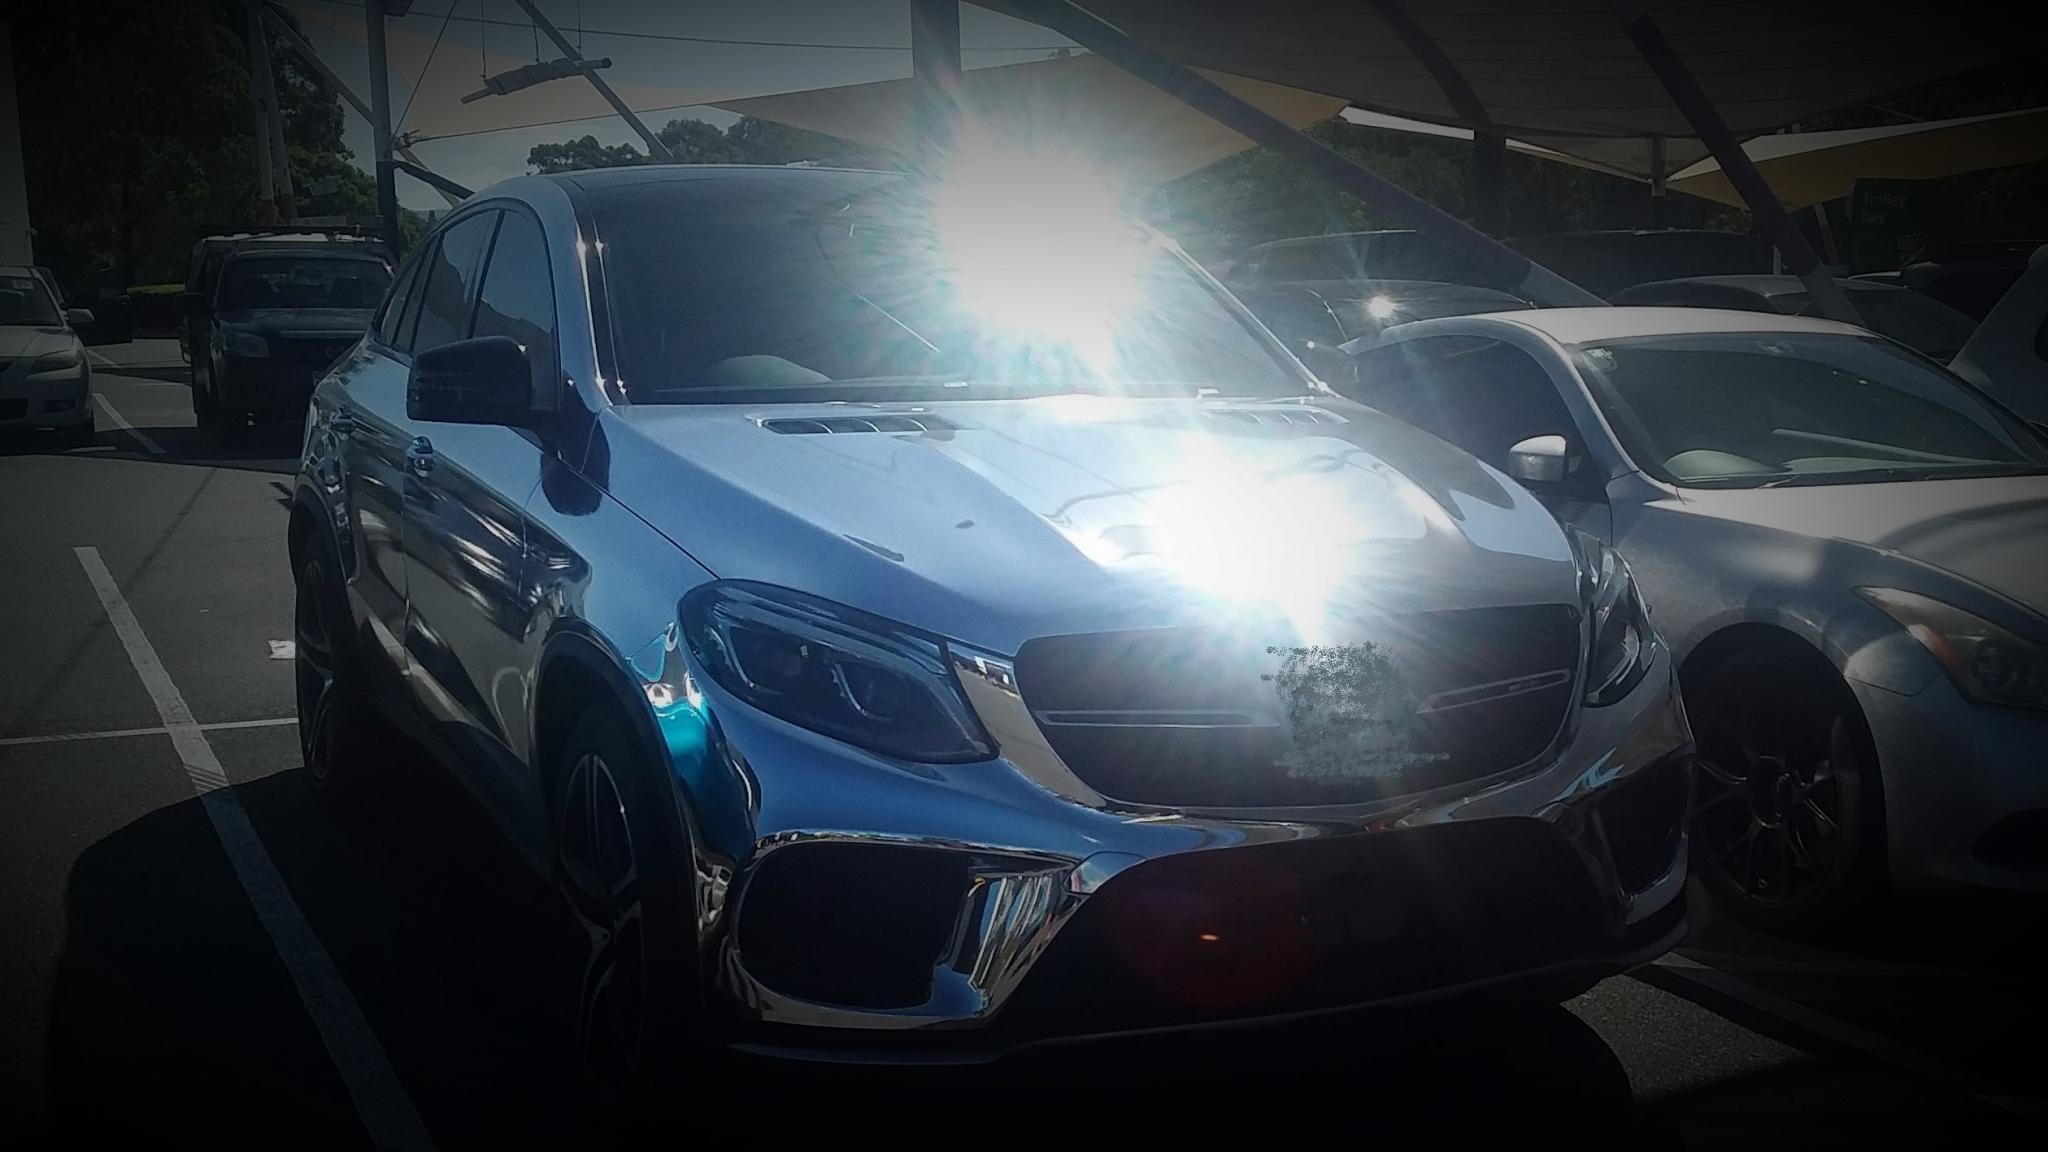 Name That Car-20200217_151440-3-jpg